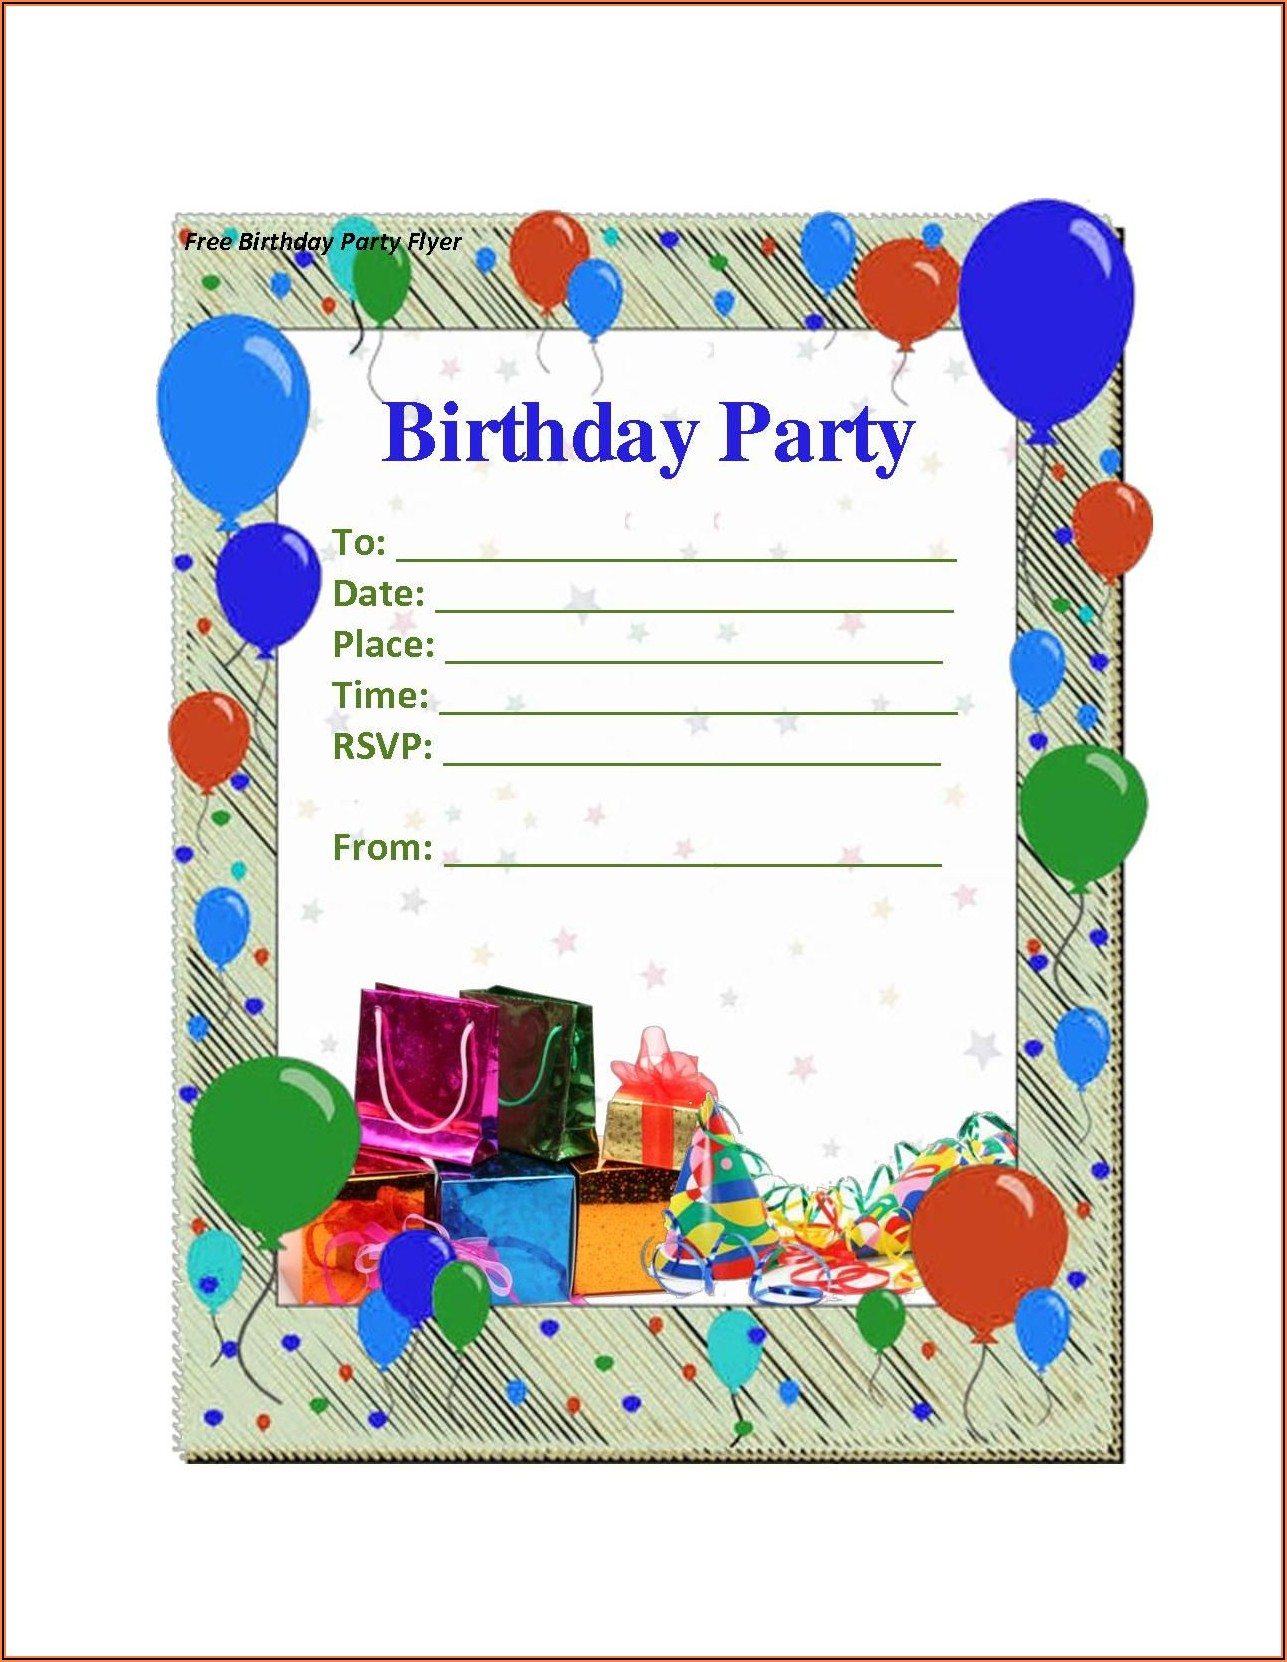 Free Invitation Maker Online Printable